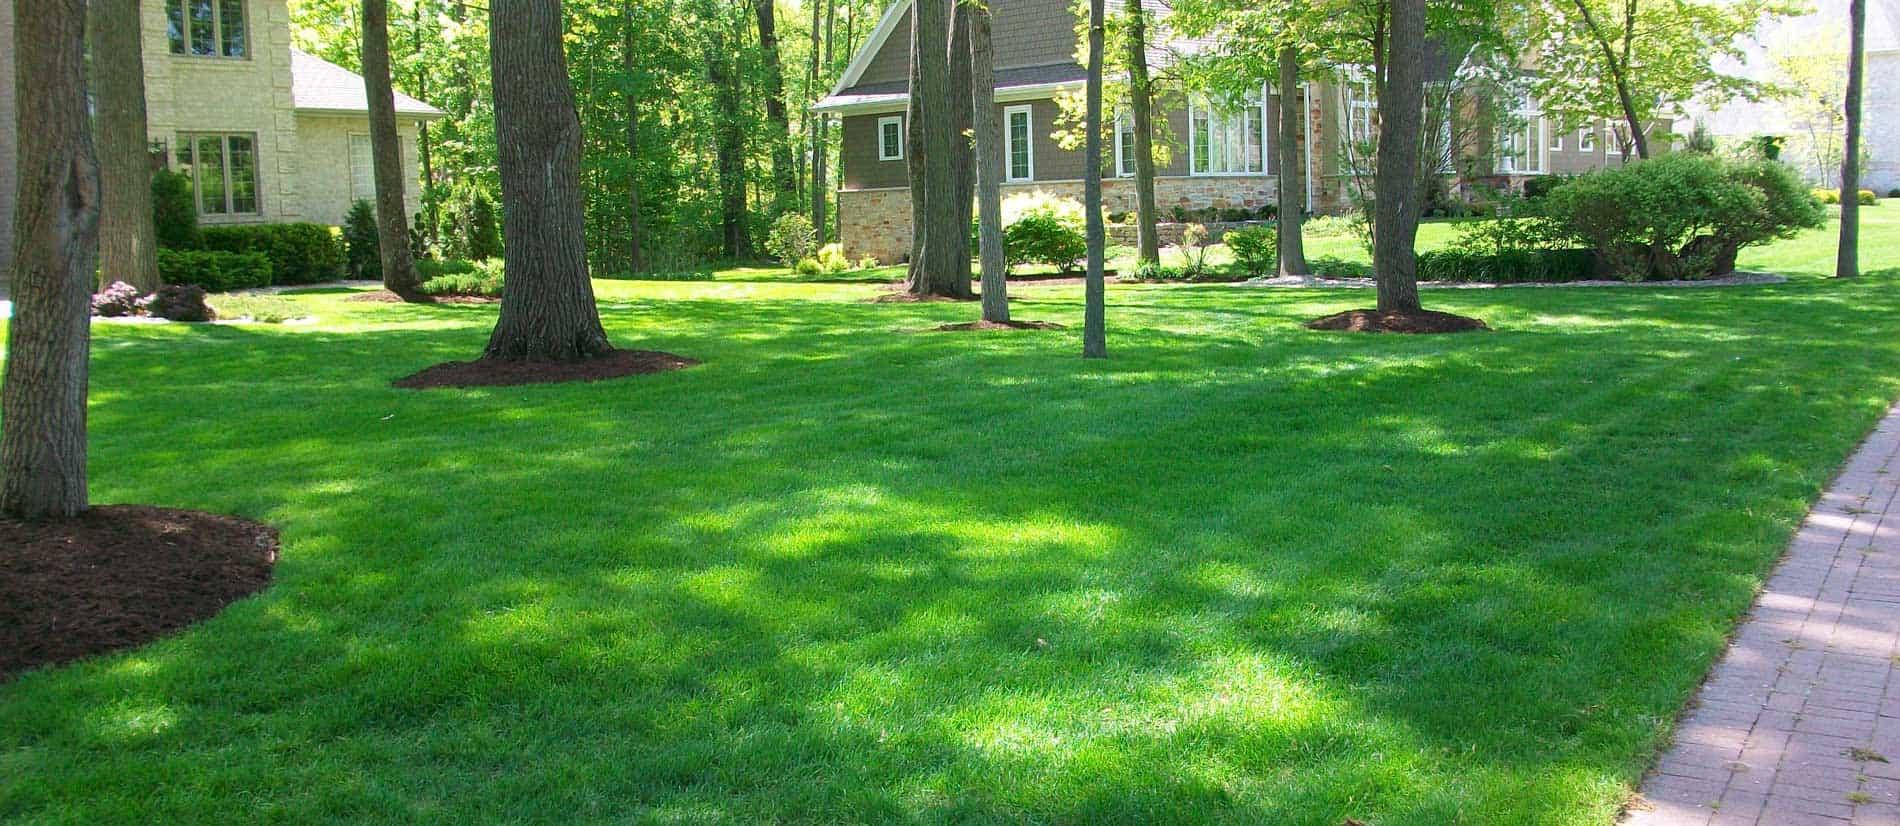 Straw Hat Lawn & Landscape Details Services on Updated Website